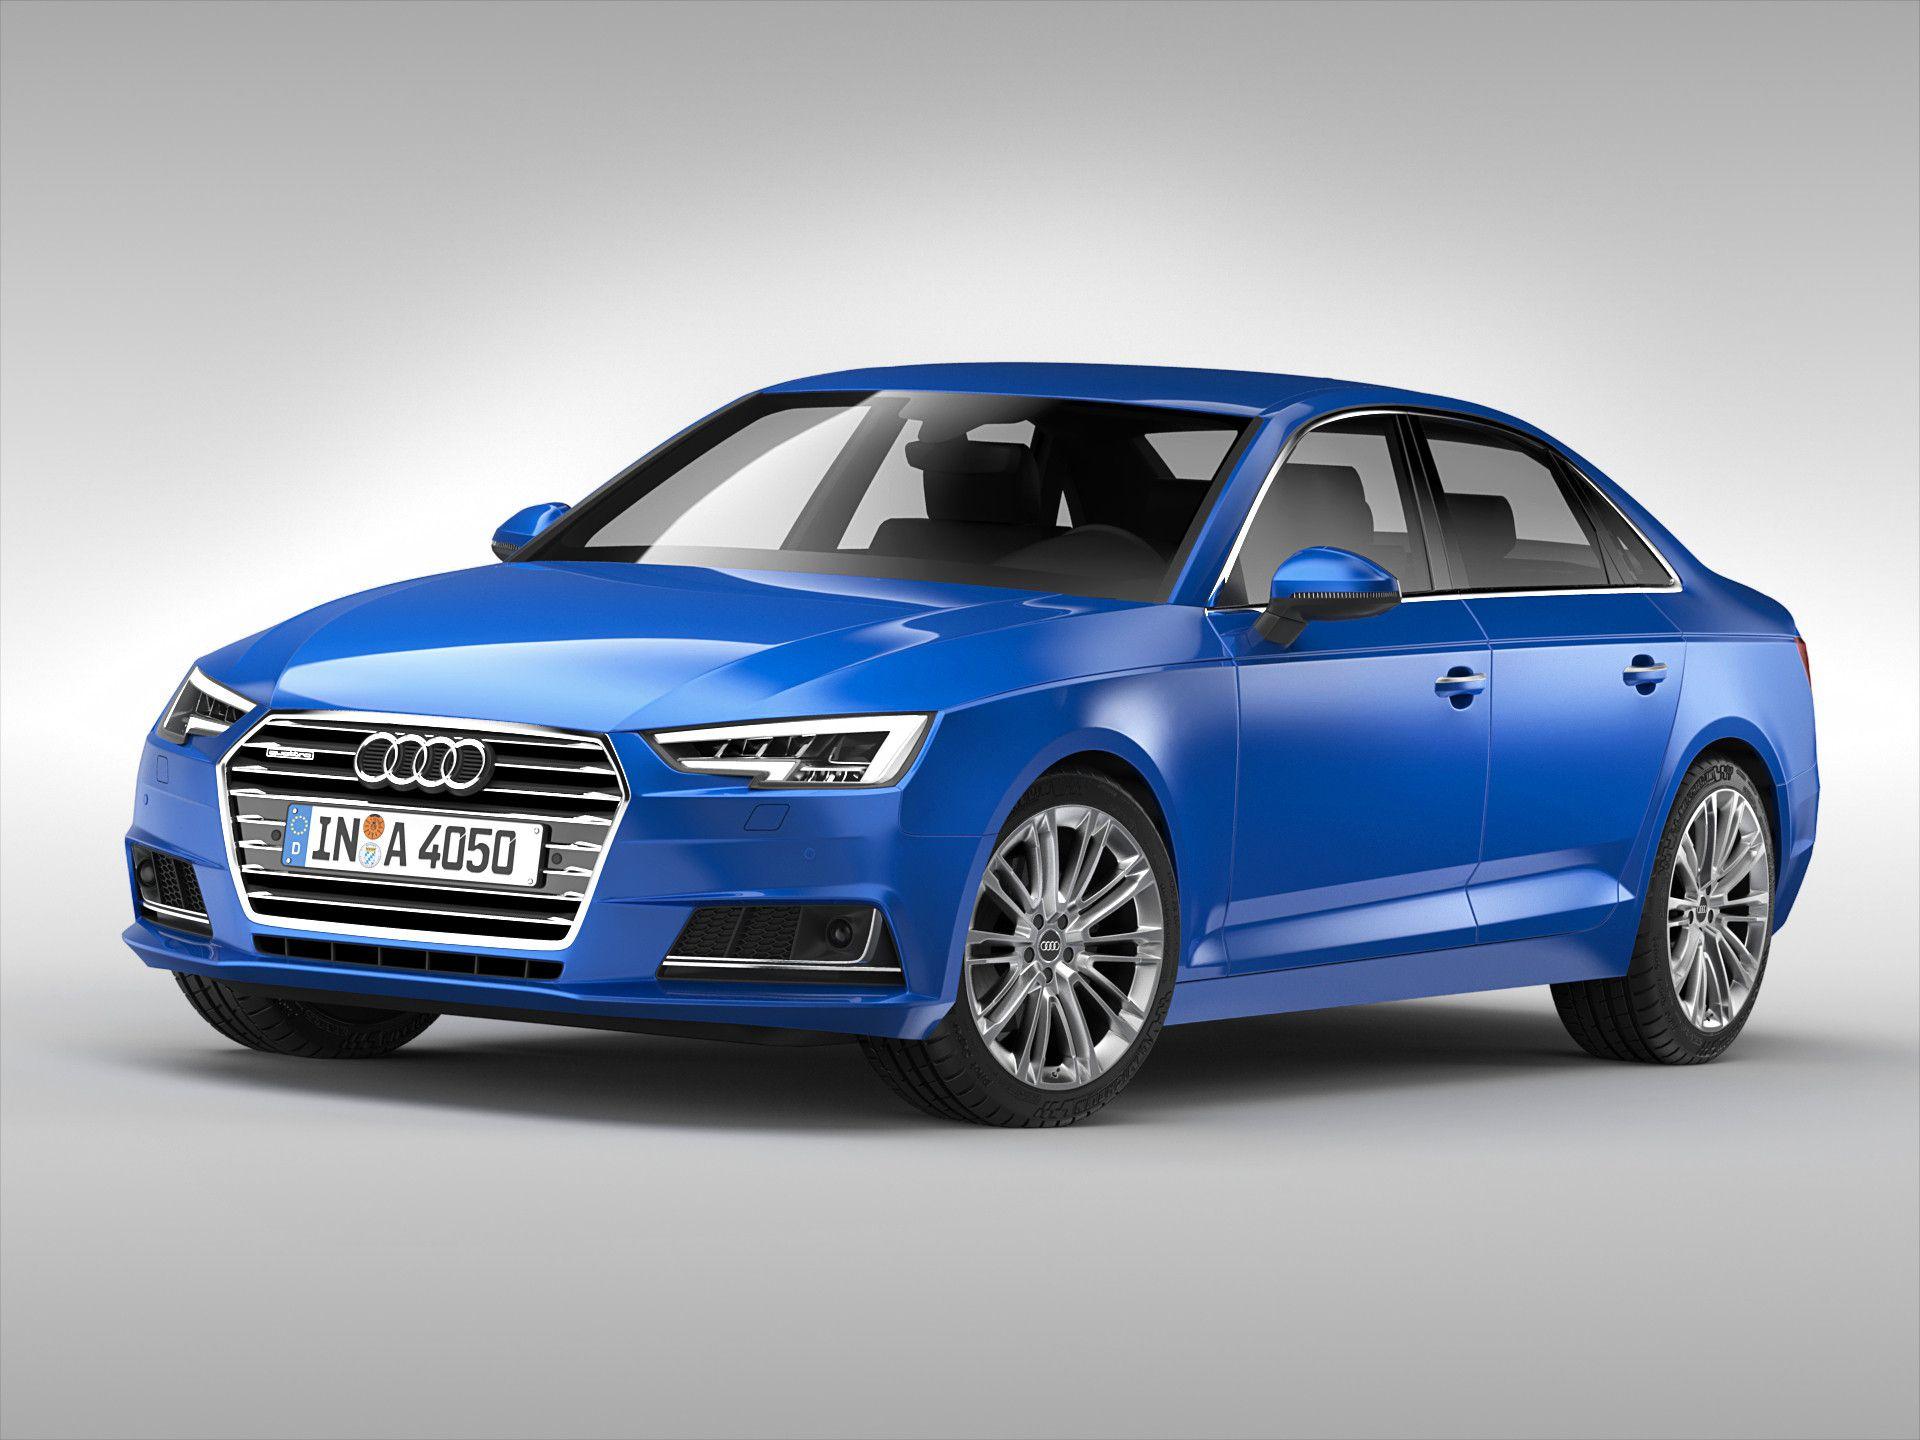 D Audi Car D Model DModeling Pinterest D And A - Audi car 3d games